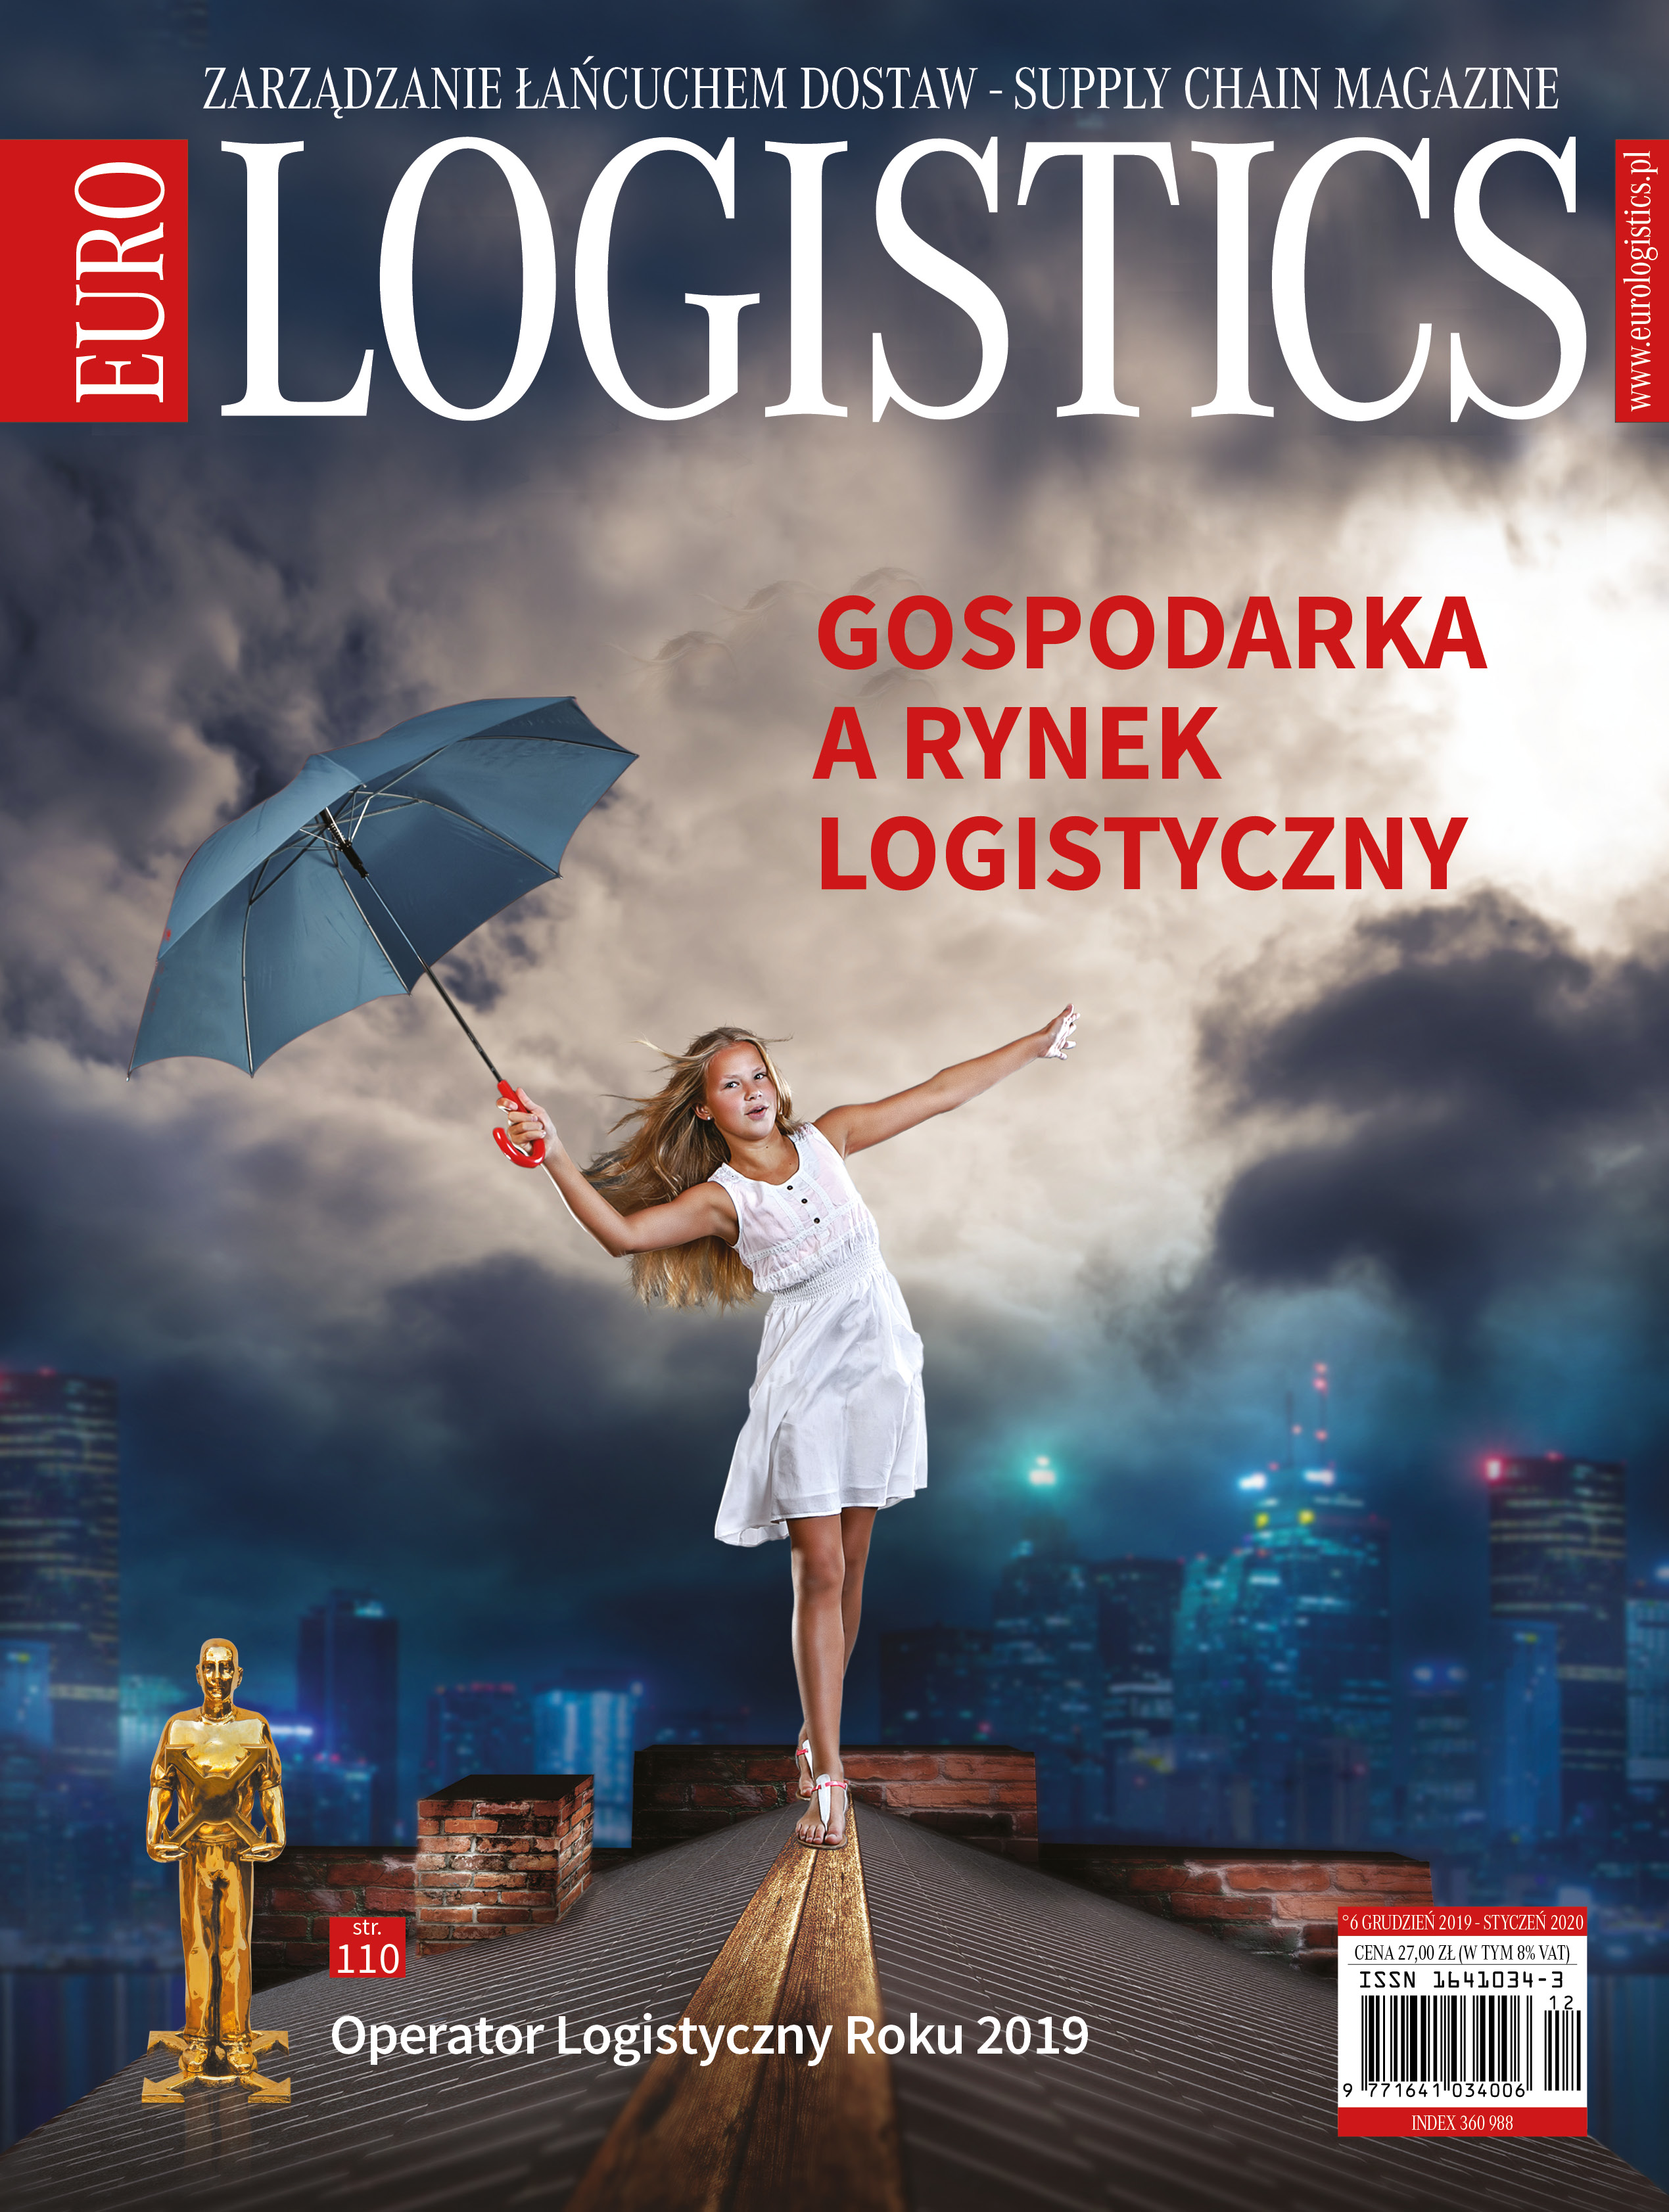 Gospodarka a rynek logistyczny